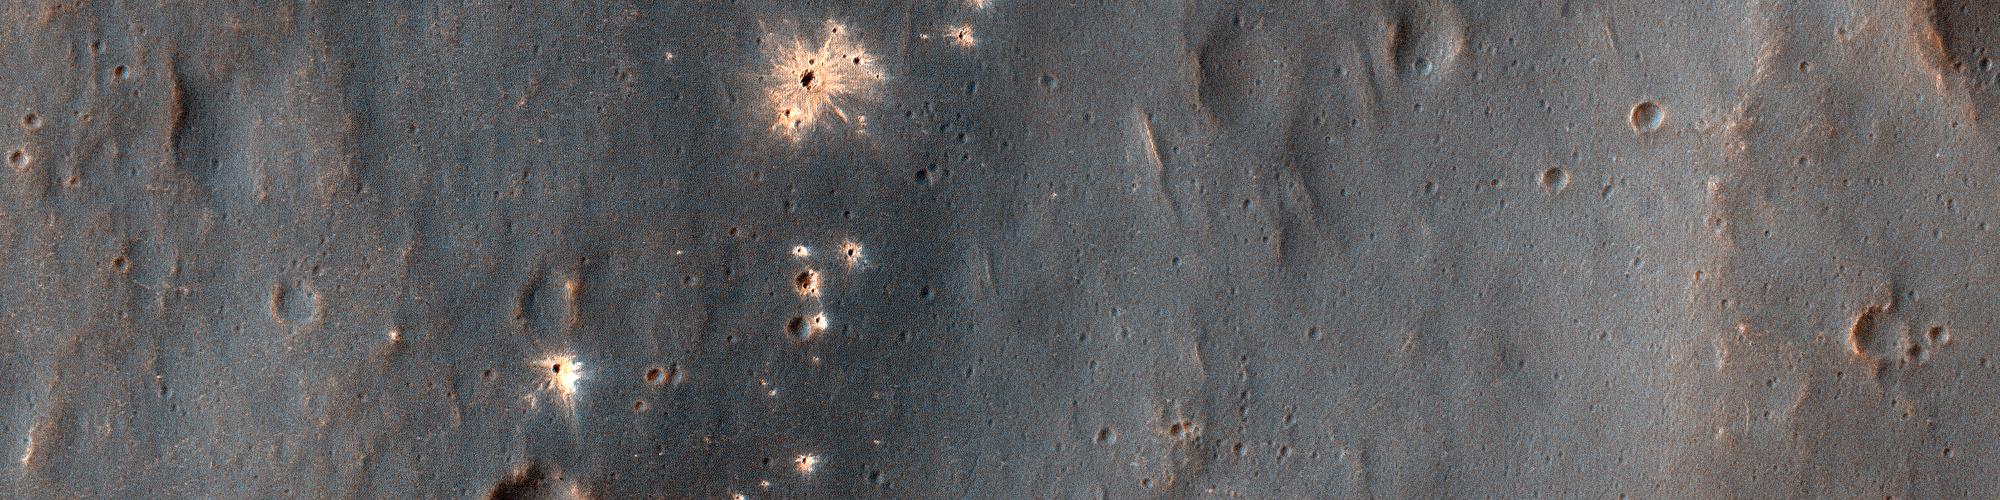 A Recent Impact Site in Noachis Terra